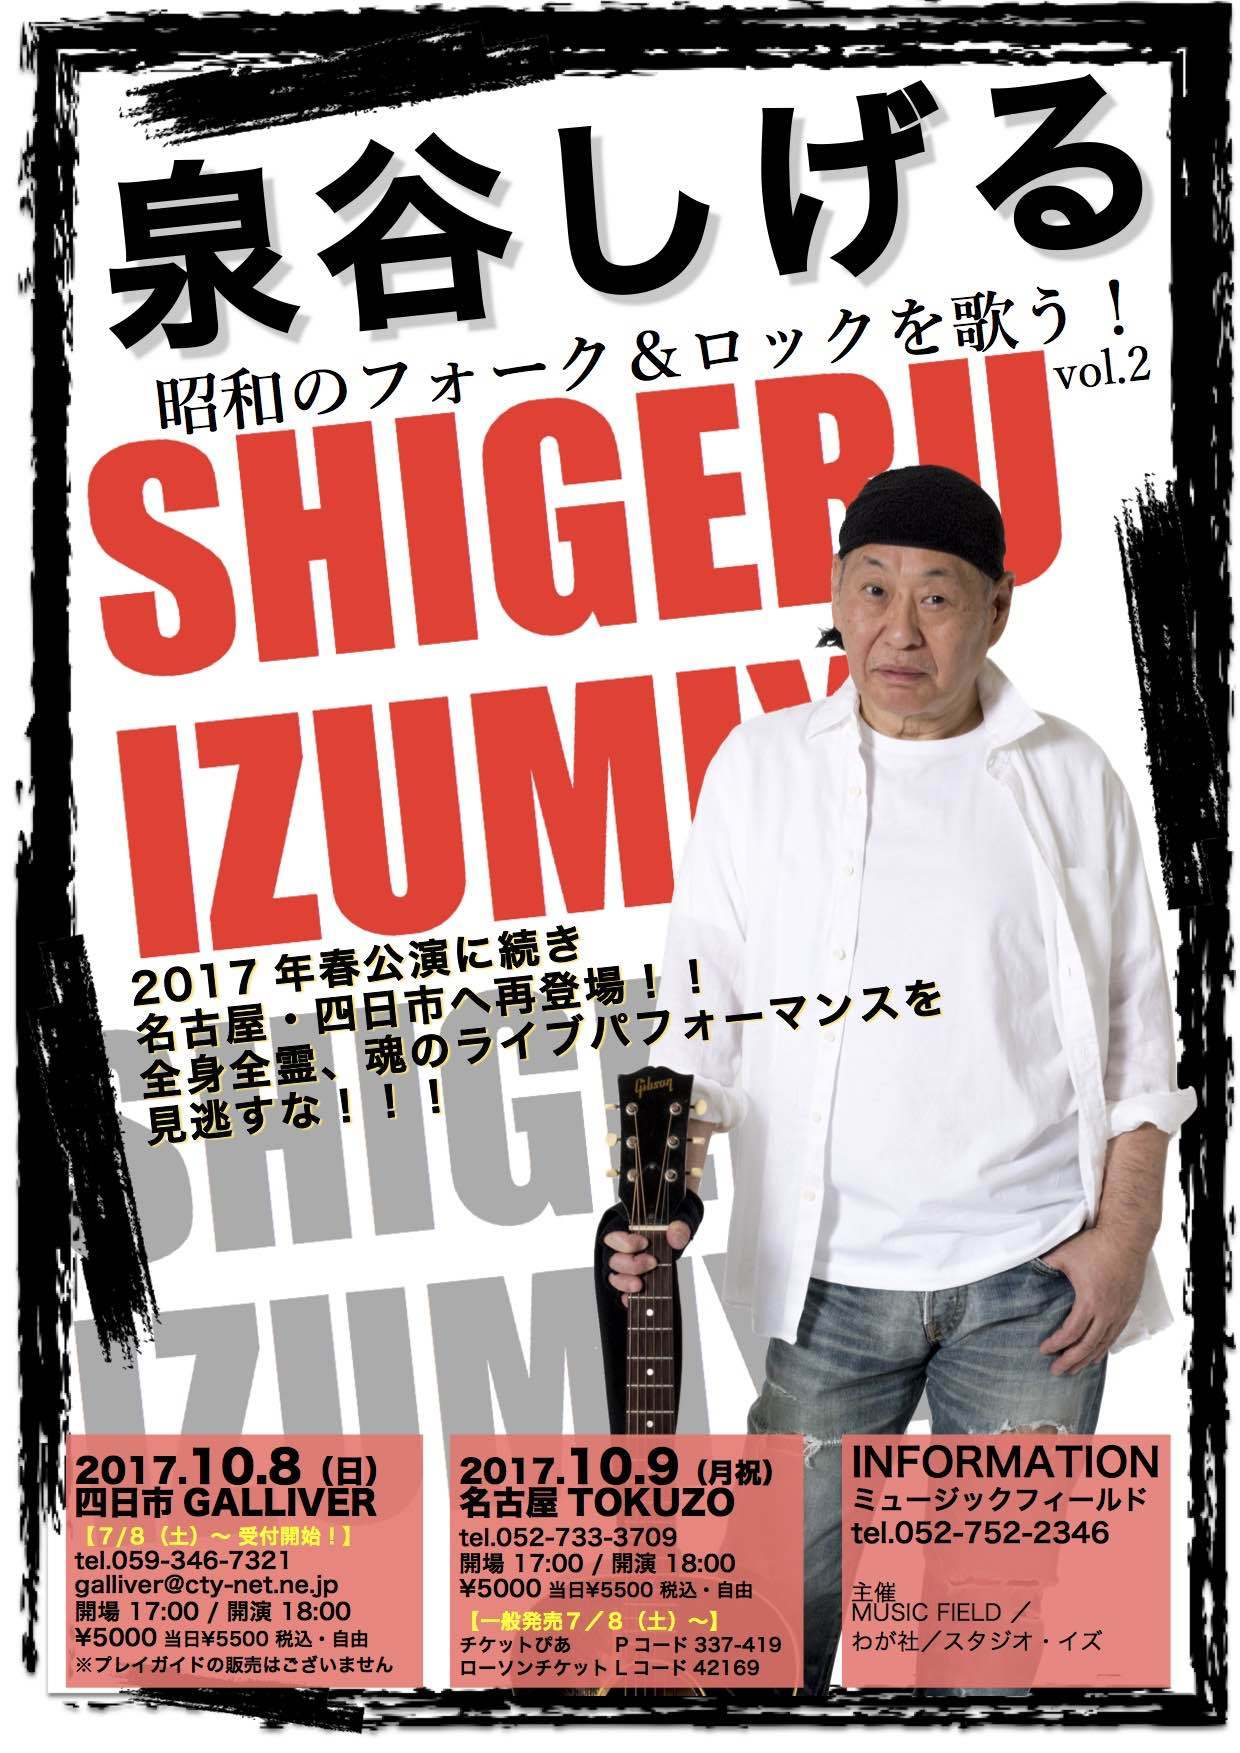 izumiya2017-akiweb.jpg